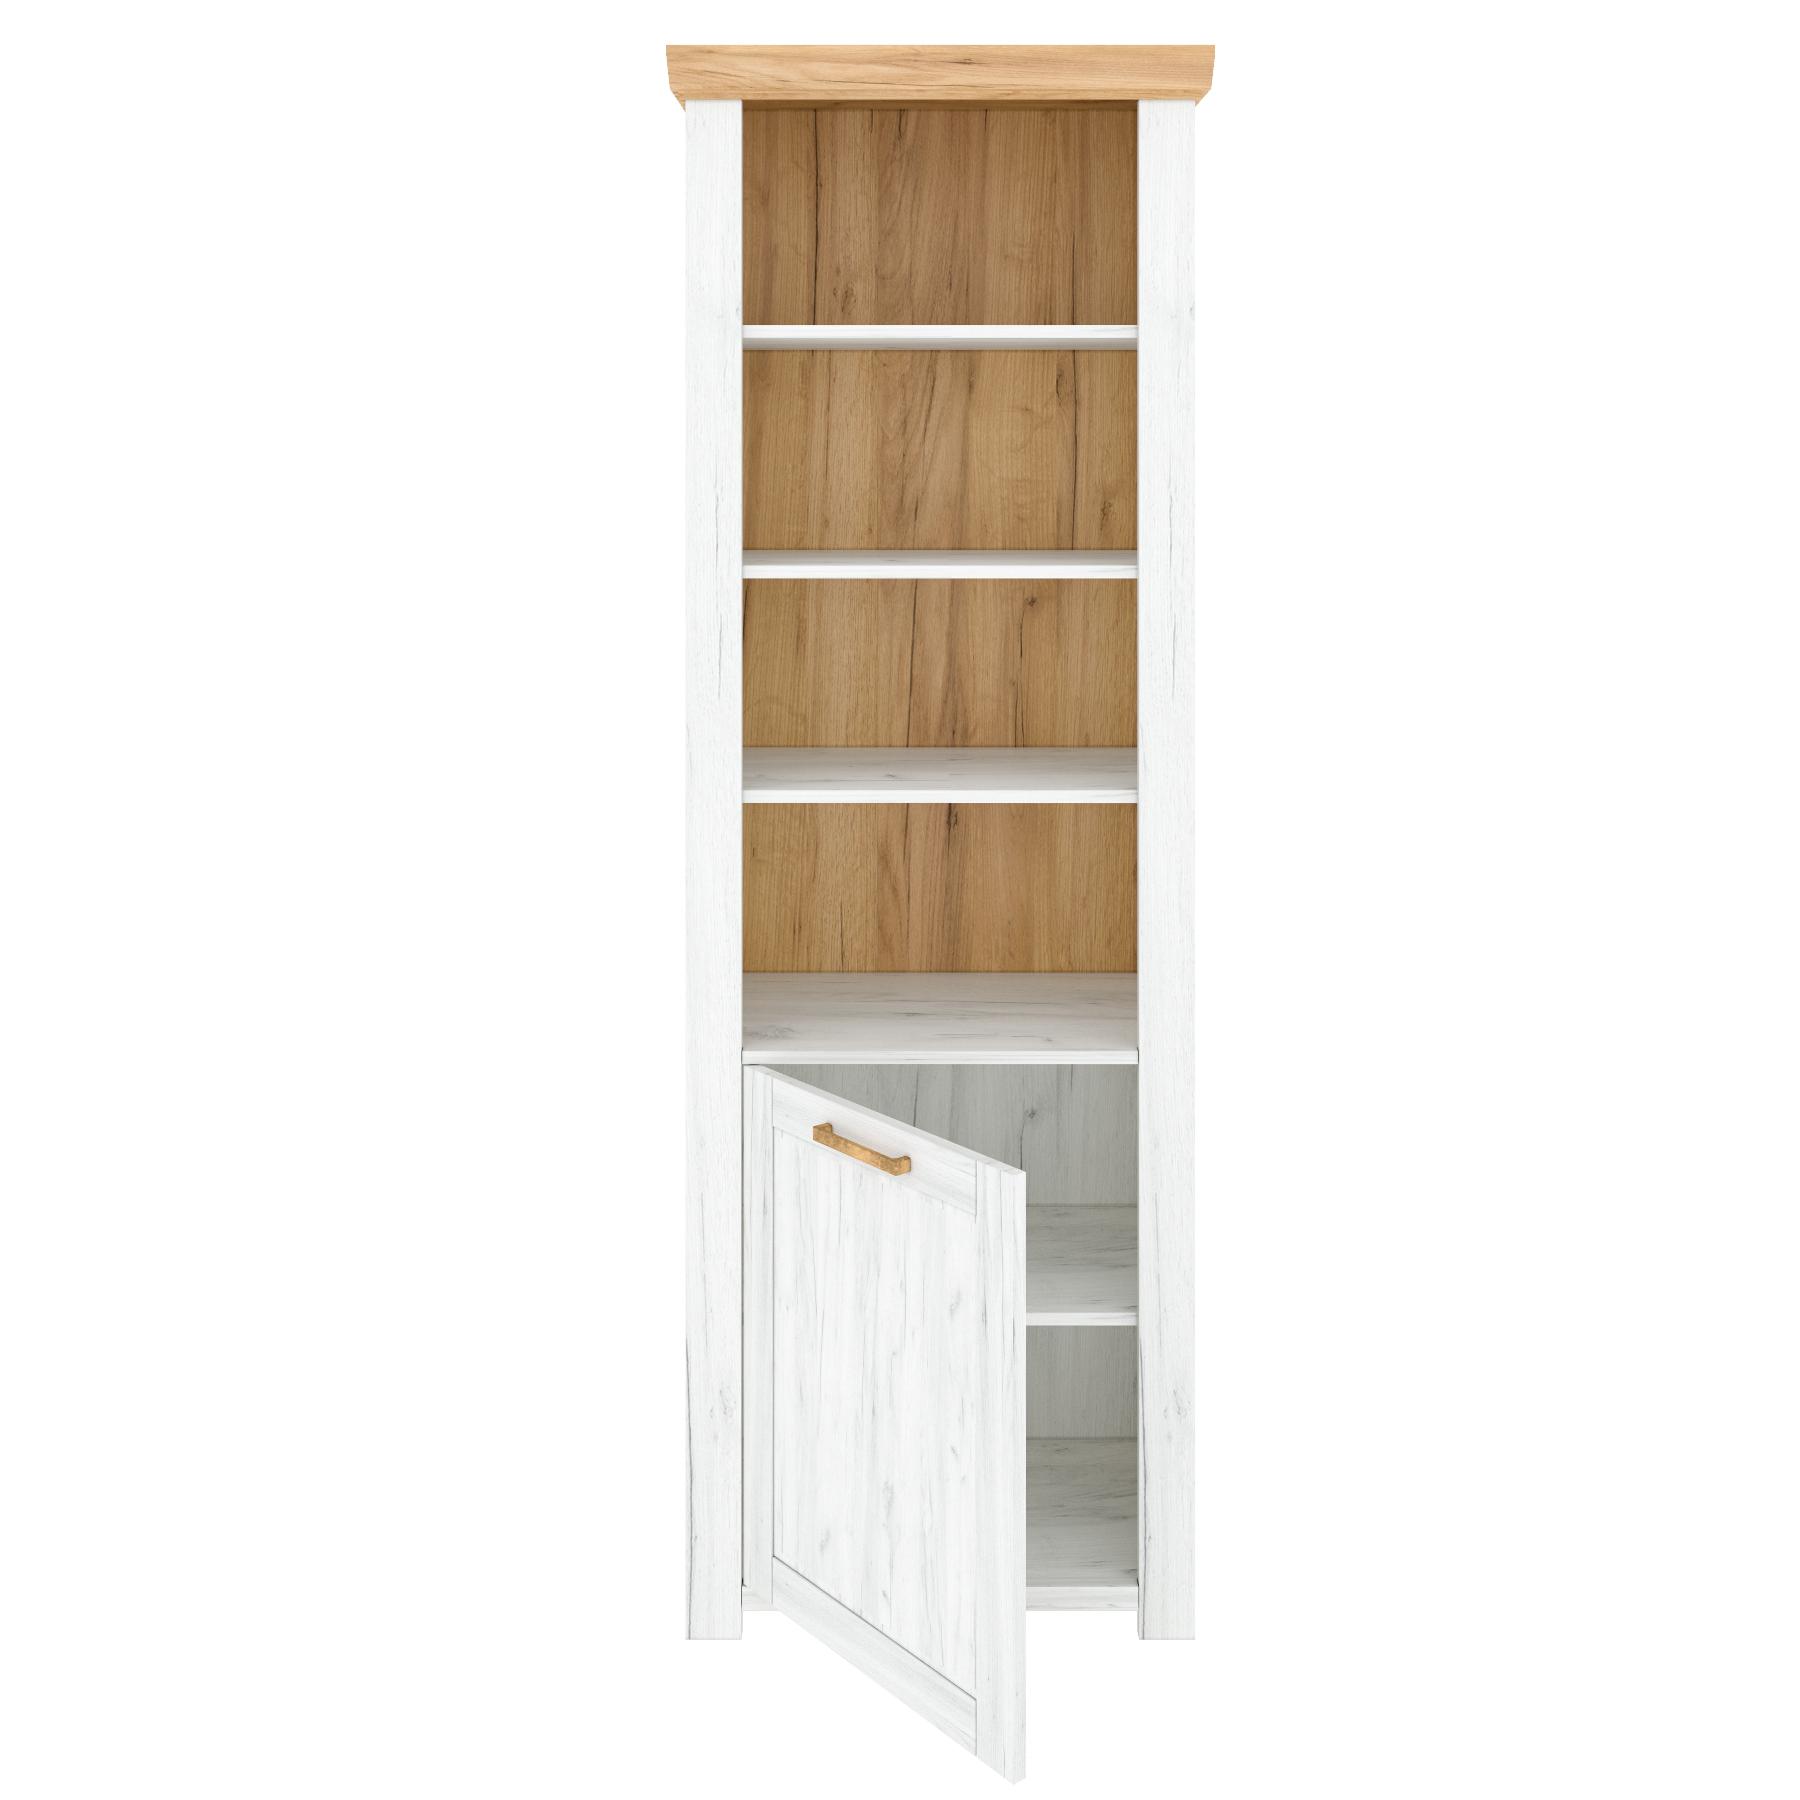 Picture of SUDBURY R Bookshelf